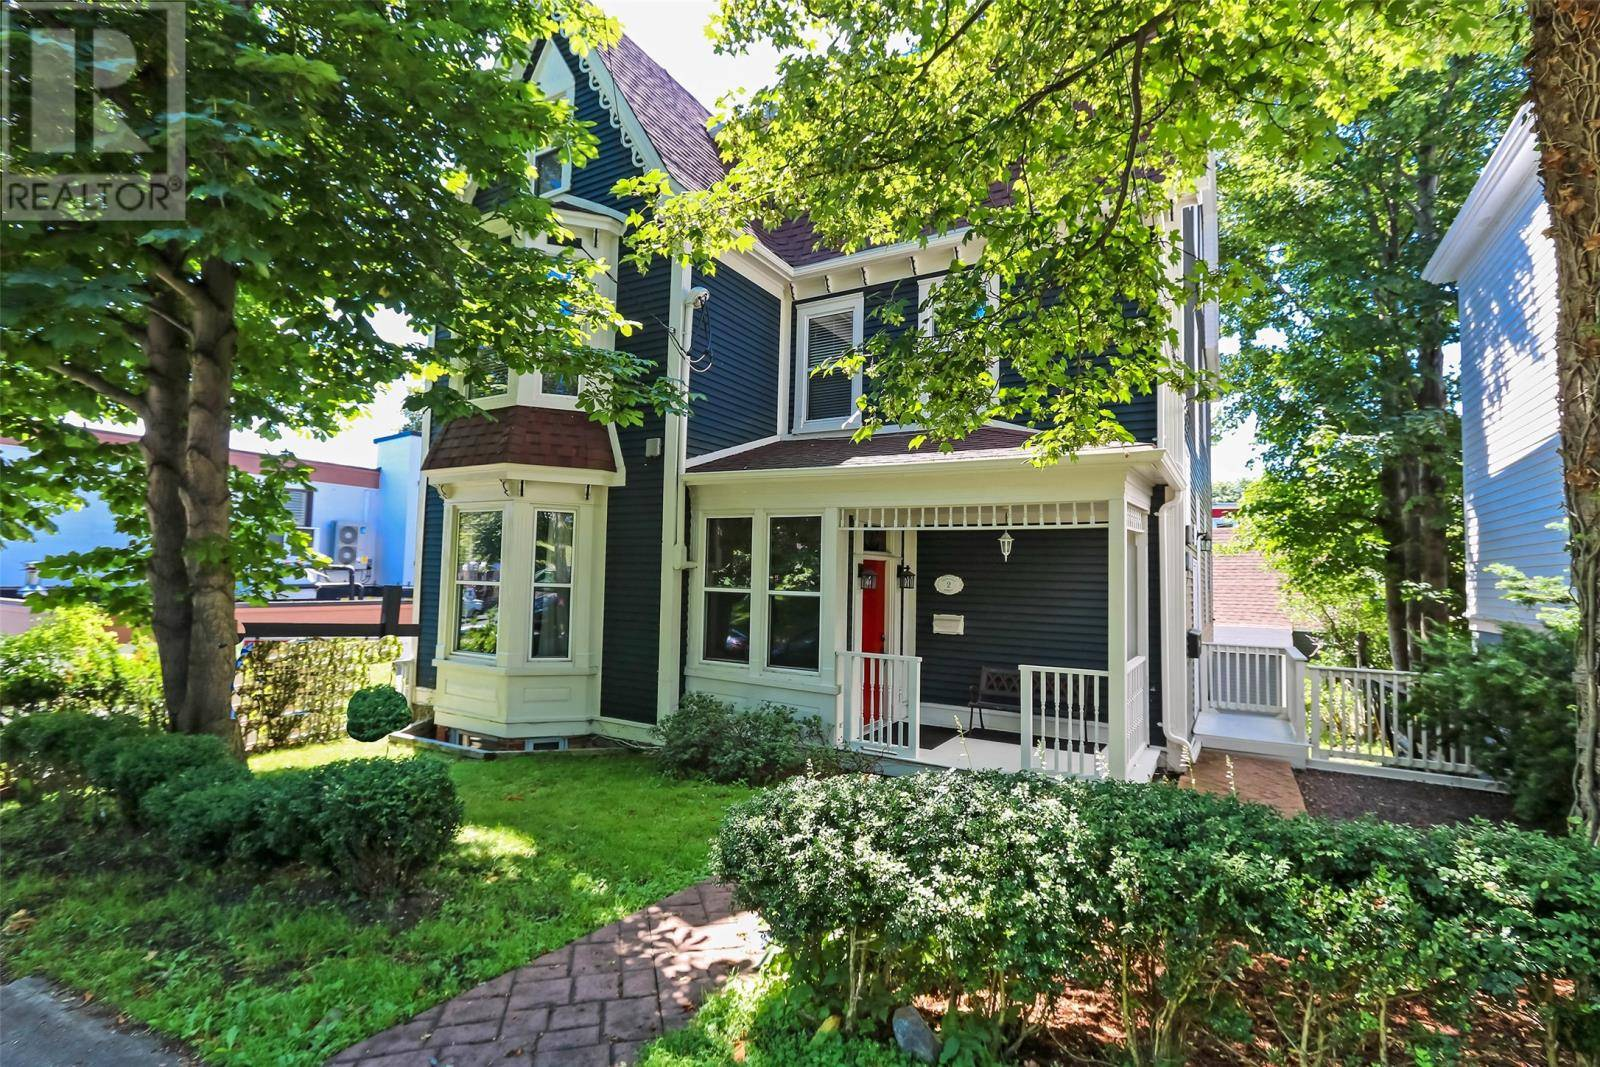 House for sale at 2 Ordnance St Unit 301 St. John's Newfoundland - MLS: 1200728